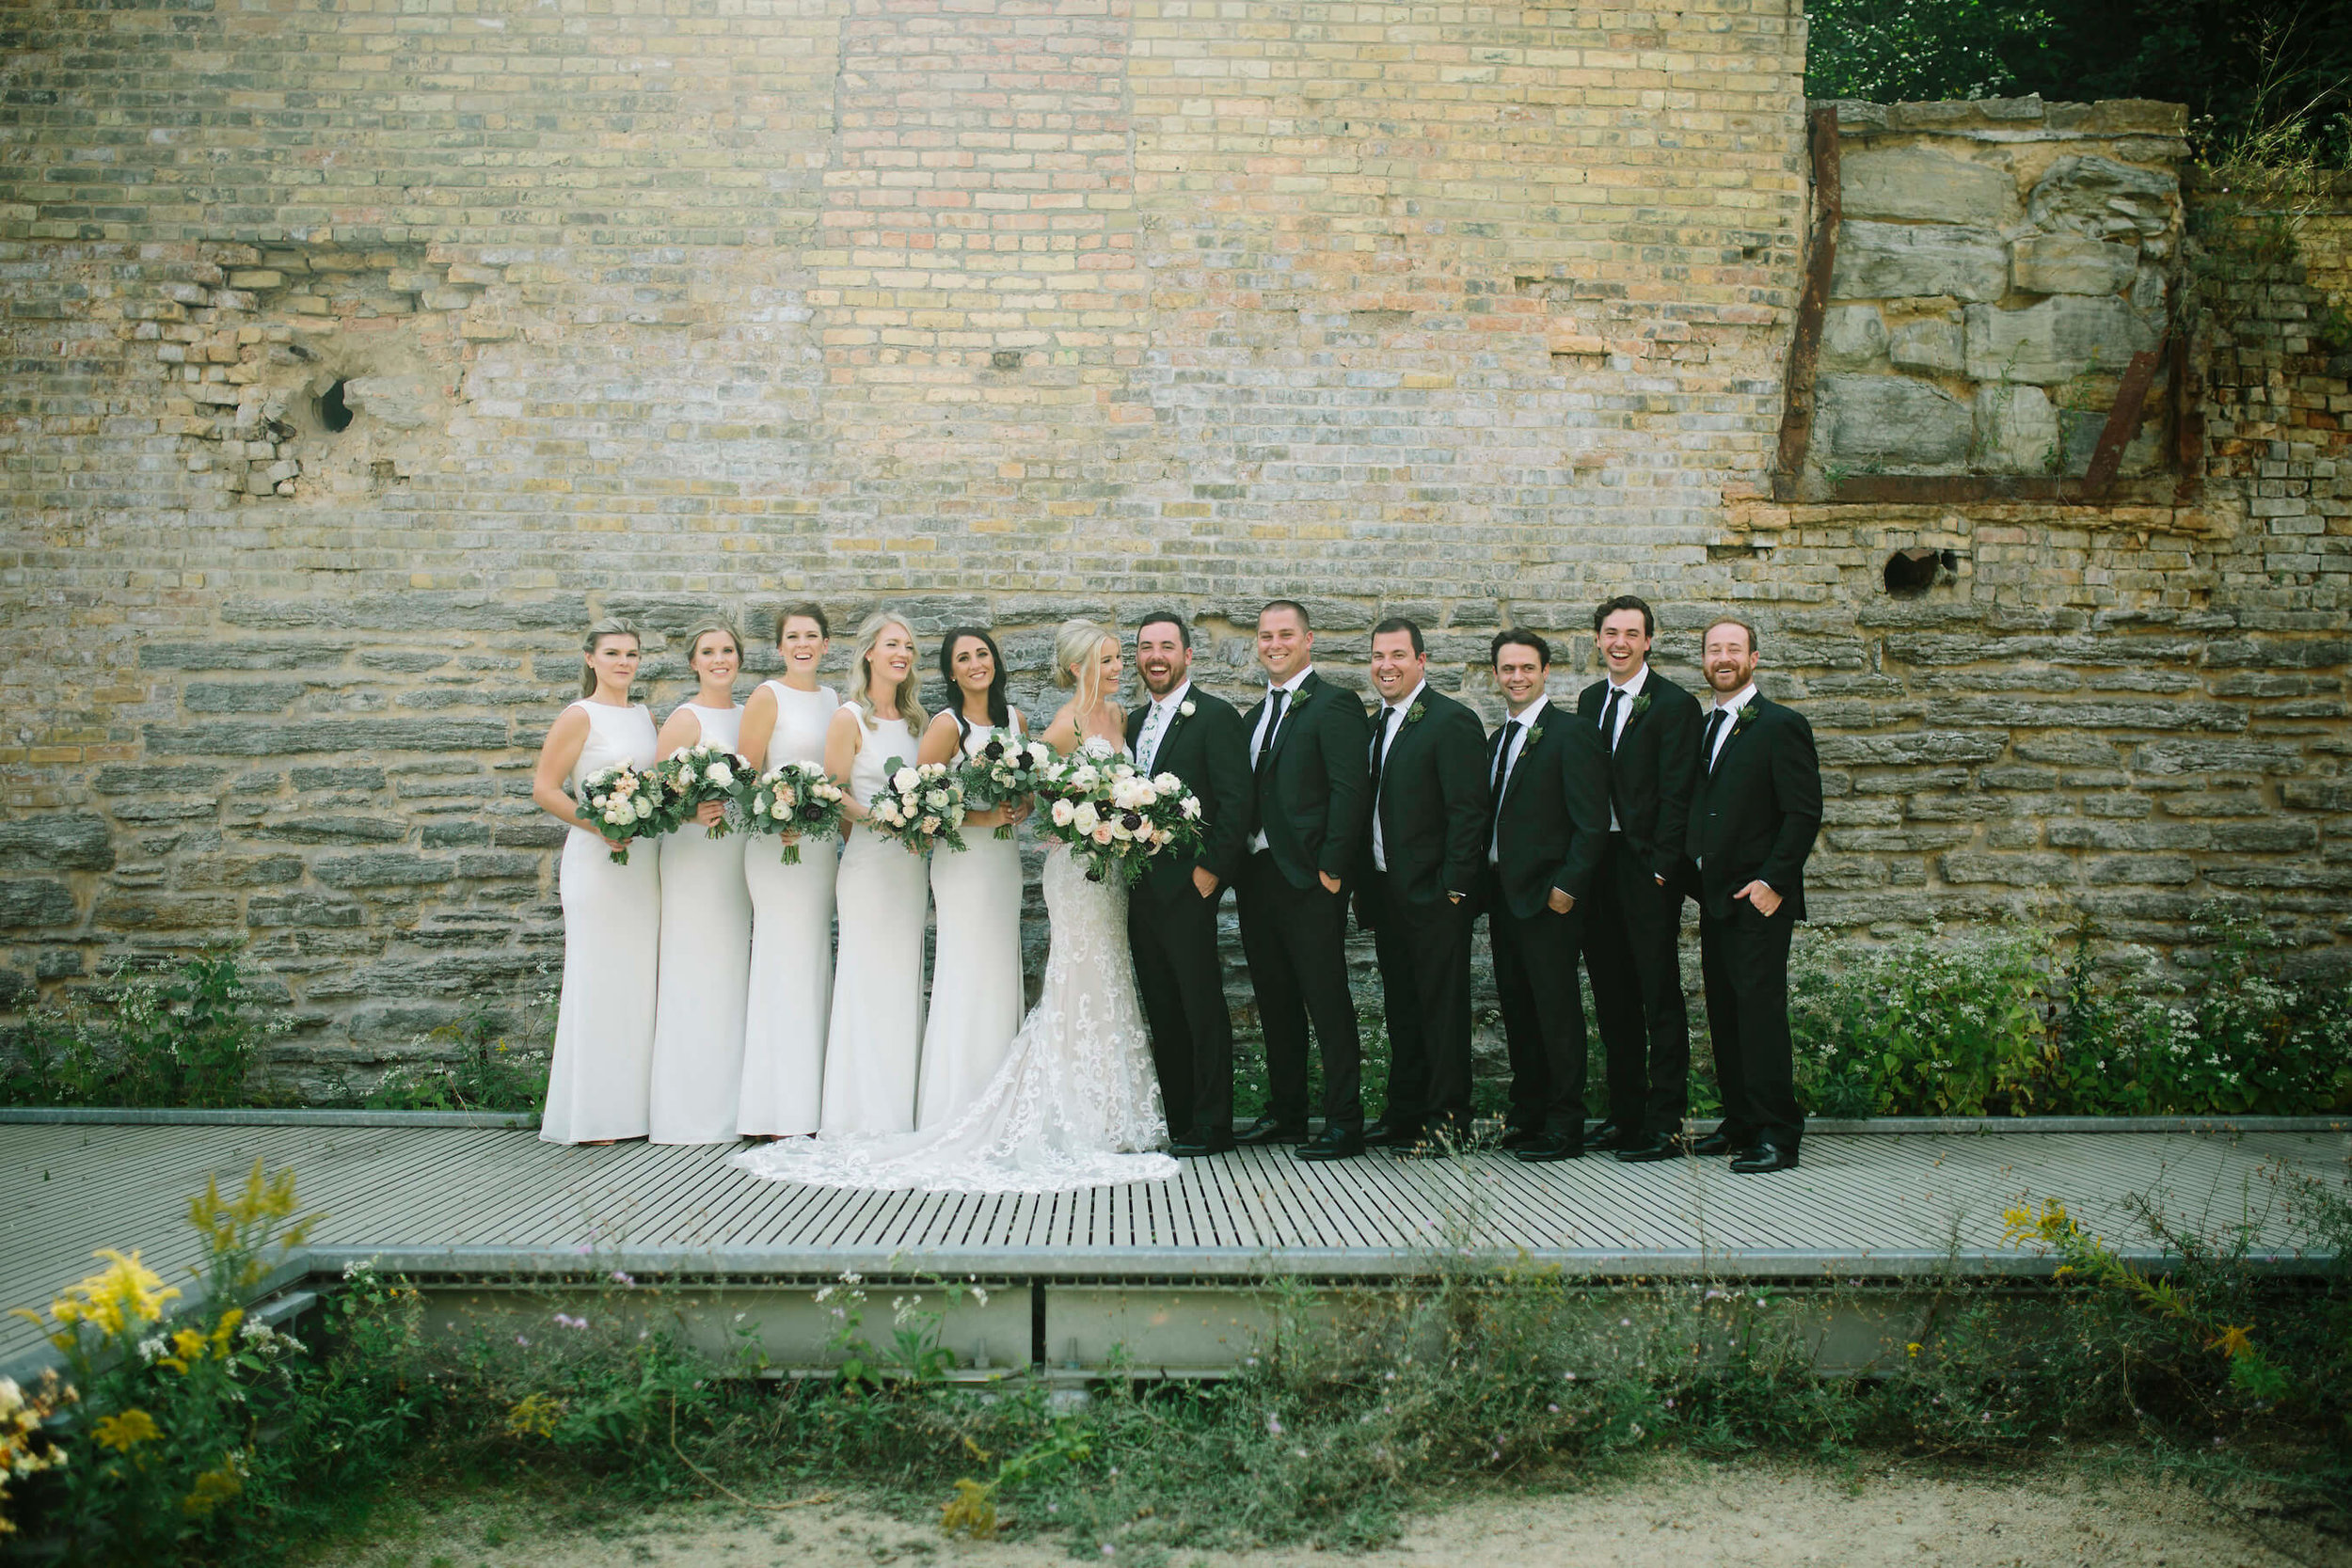 engle-olson-april-cj-wedding-jessica-holleque-3.jpg